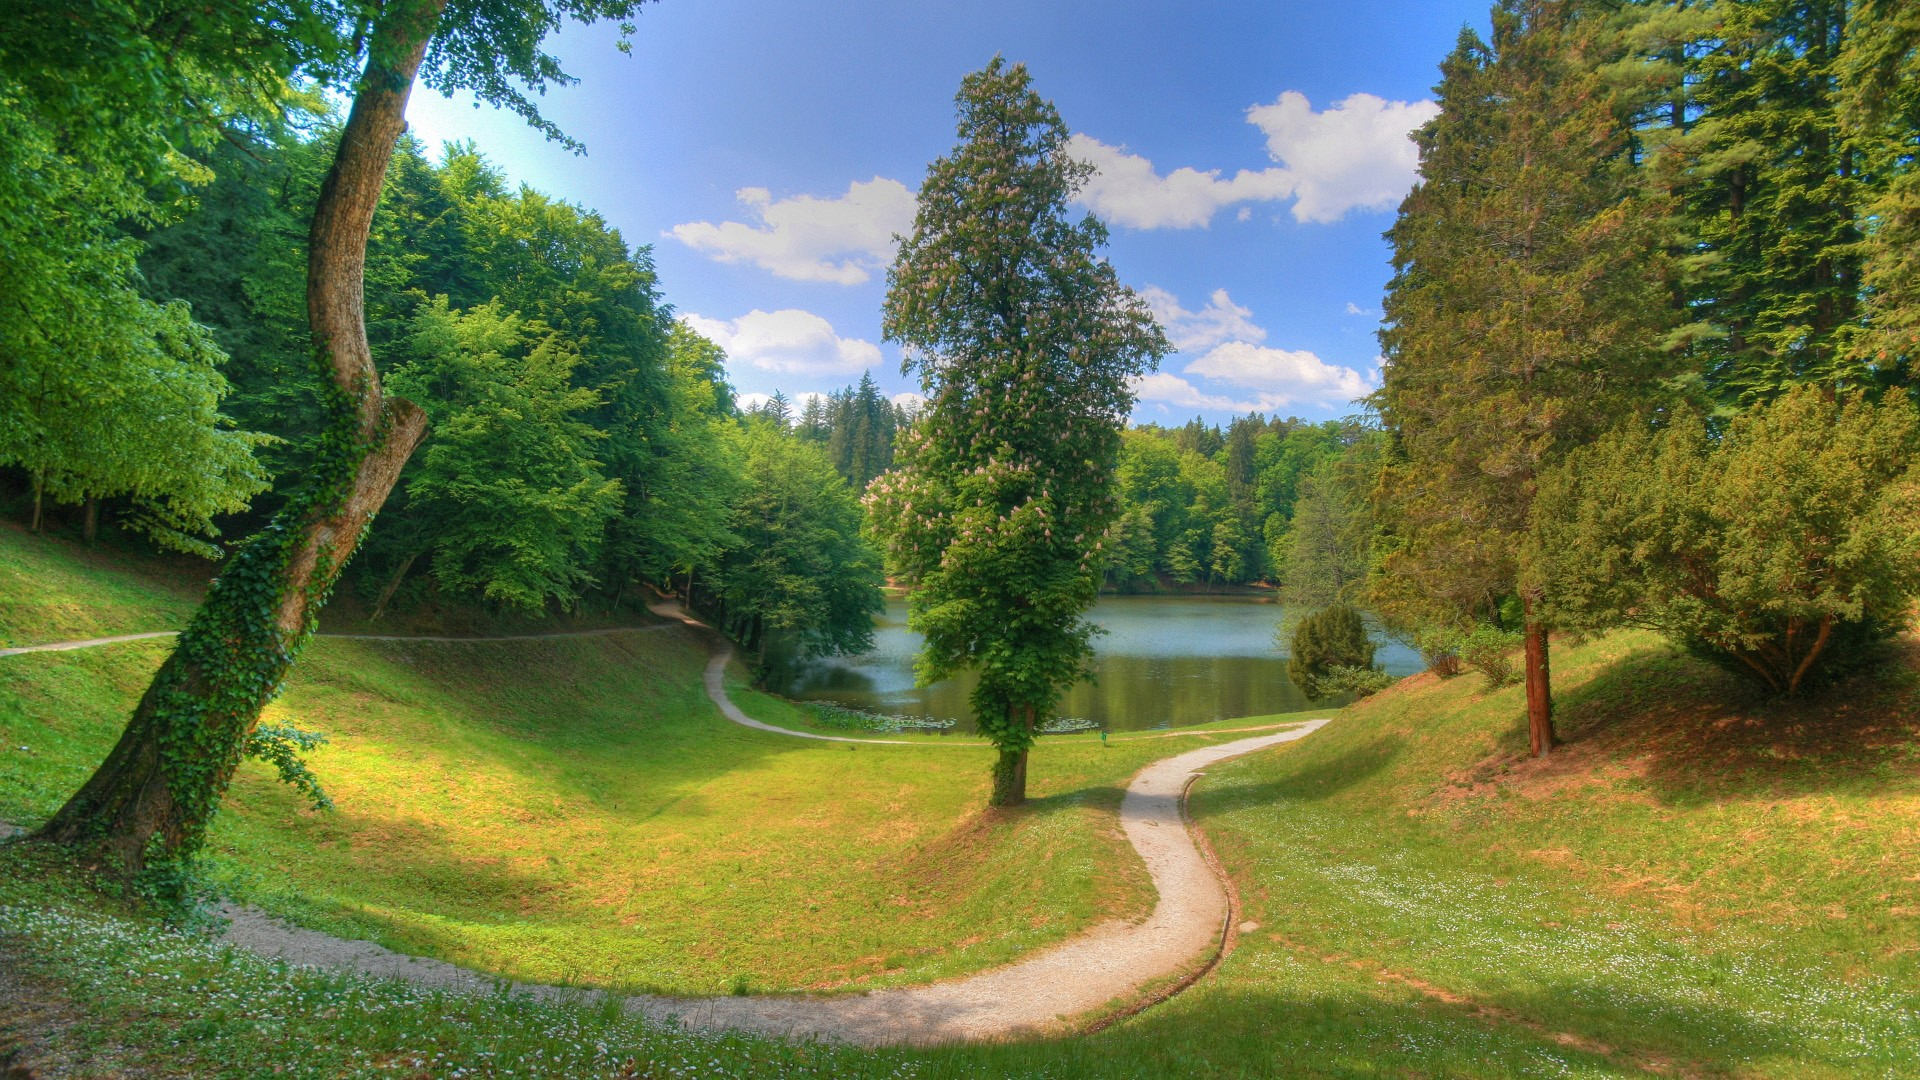 landscape nature hd wallpapers best background nature desktop 1920x1080